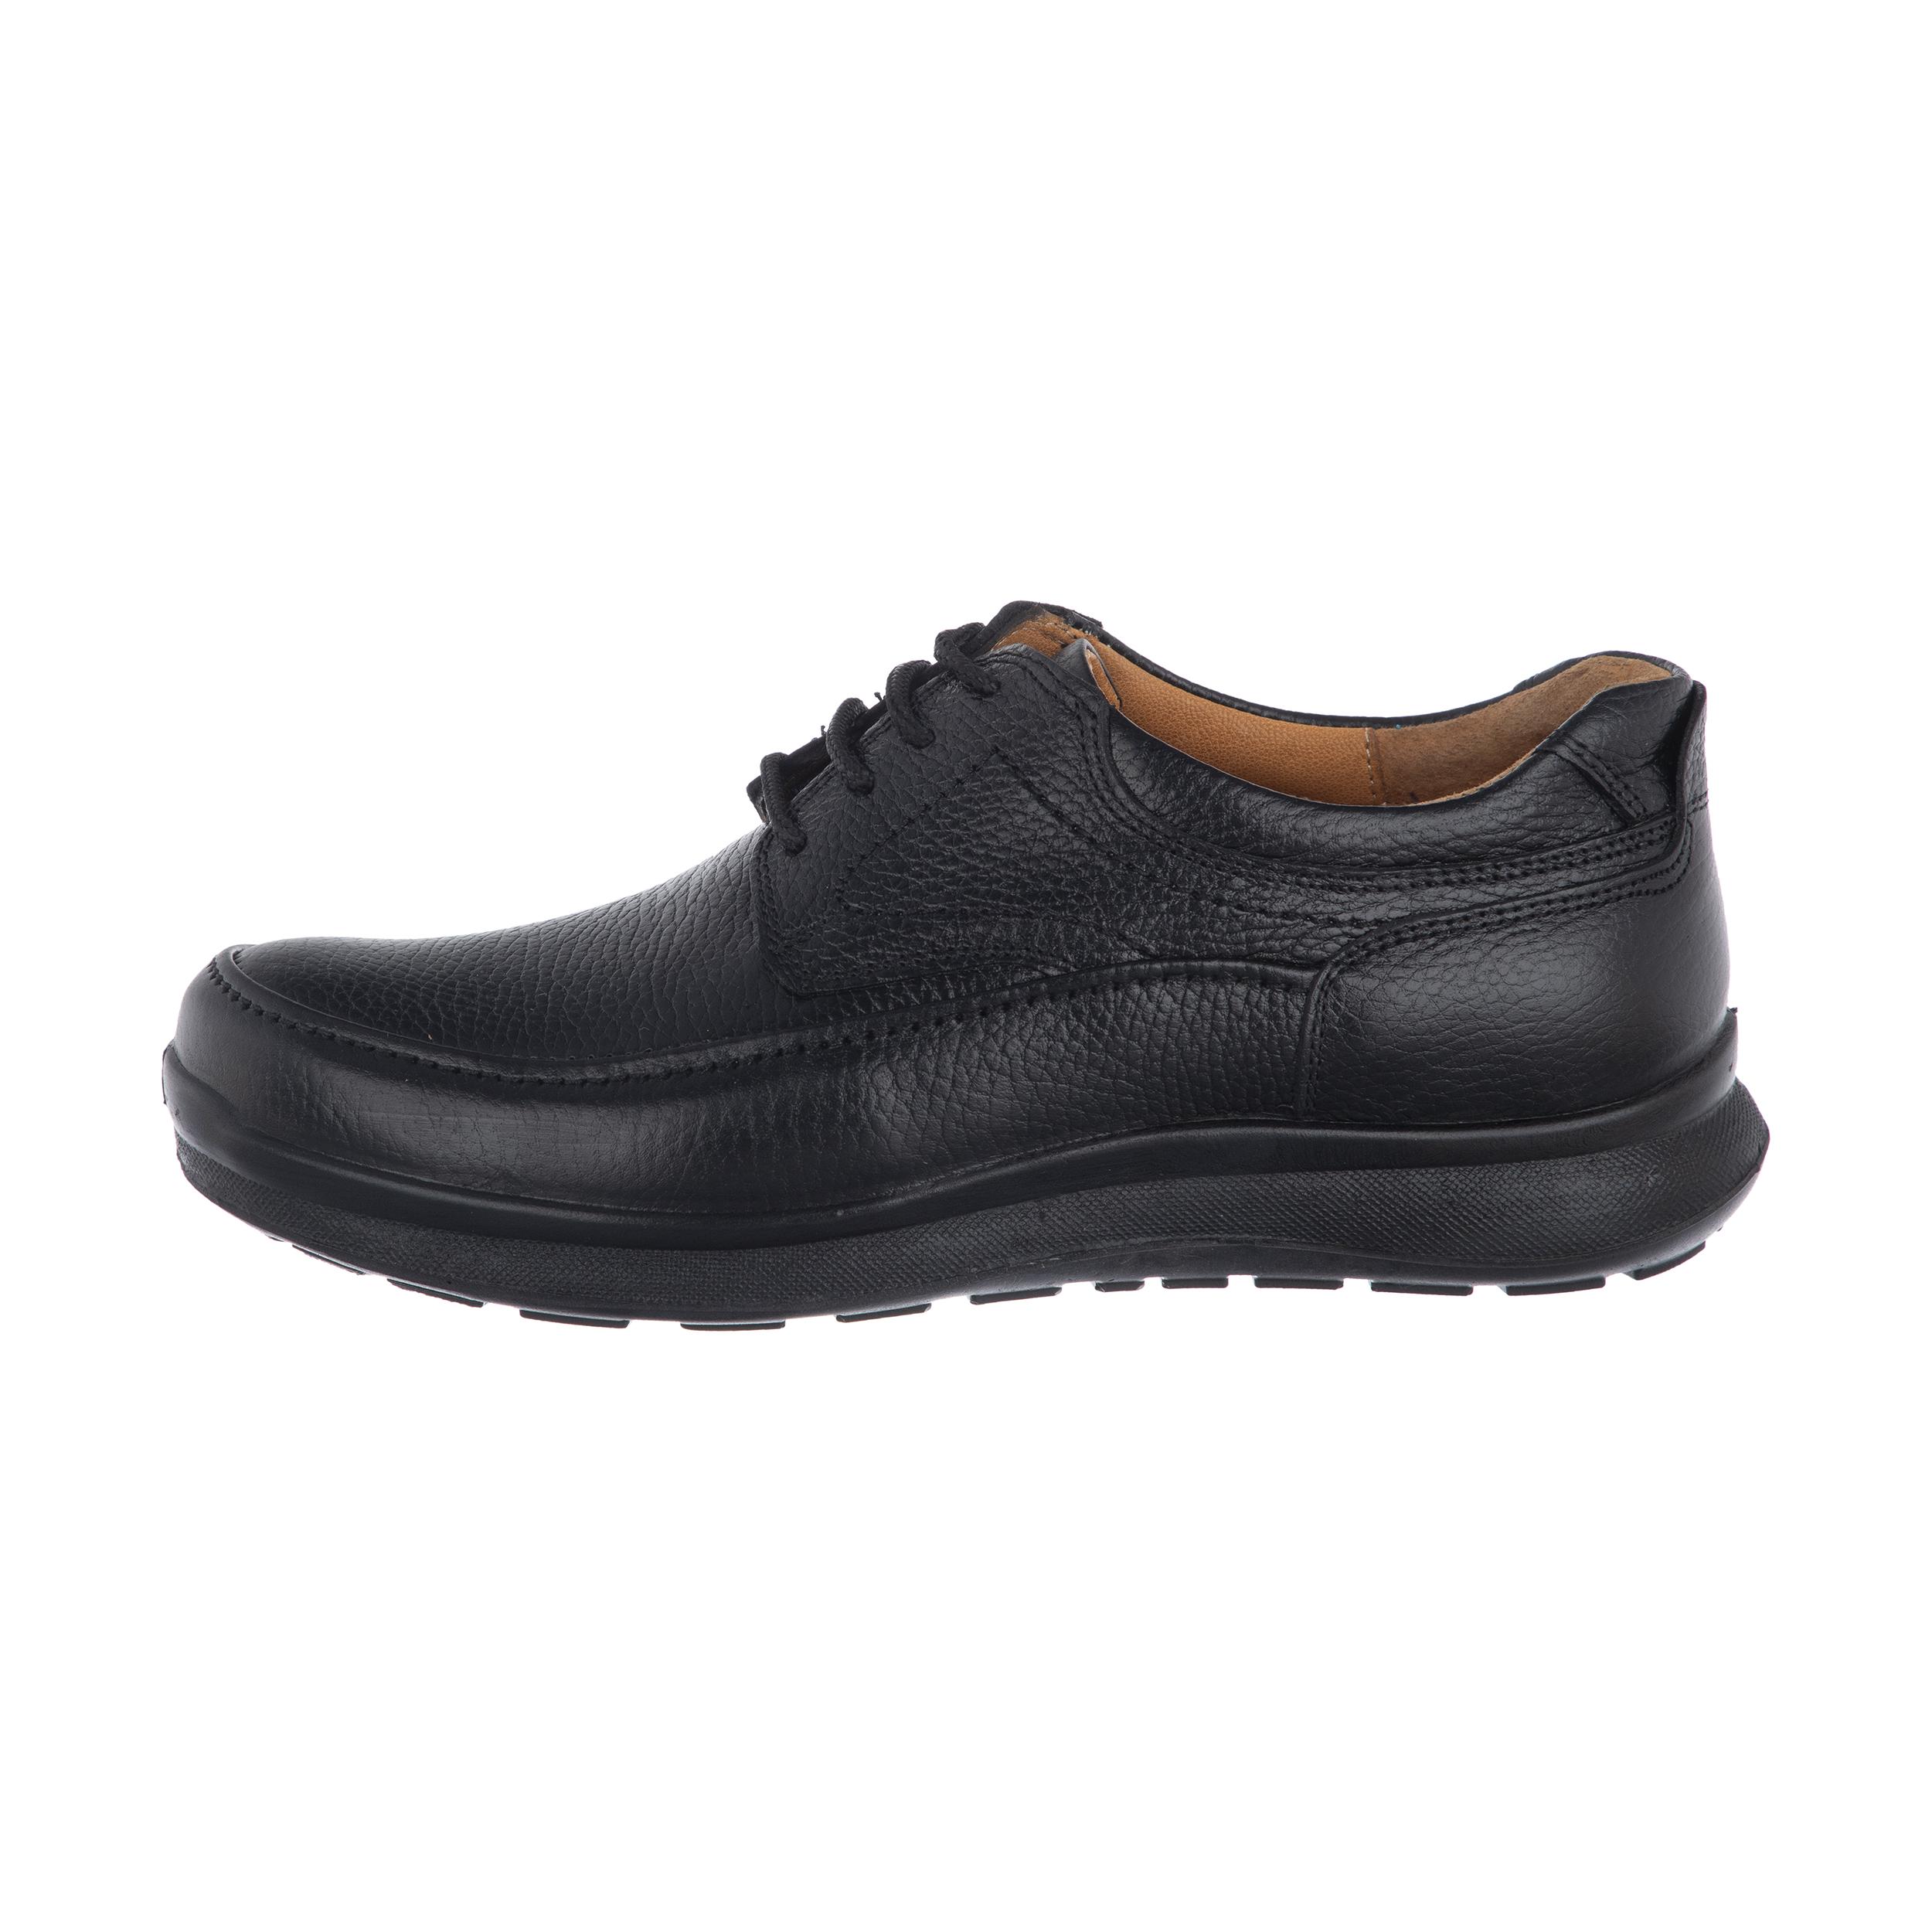 کفش روزمره مردانه آذر پلاس مدل 4401B503101